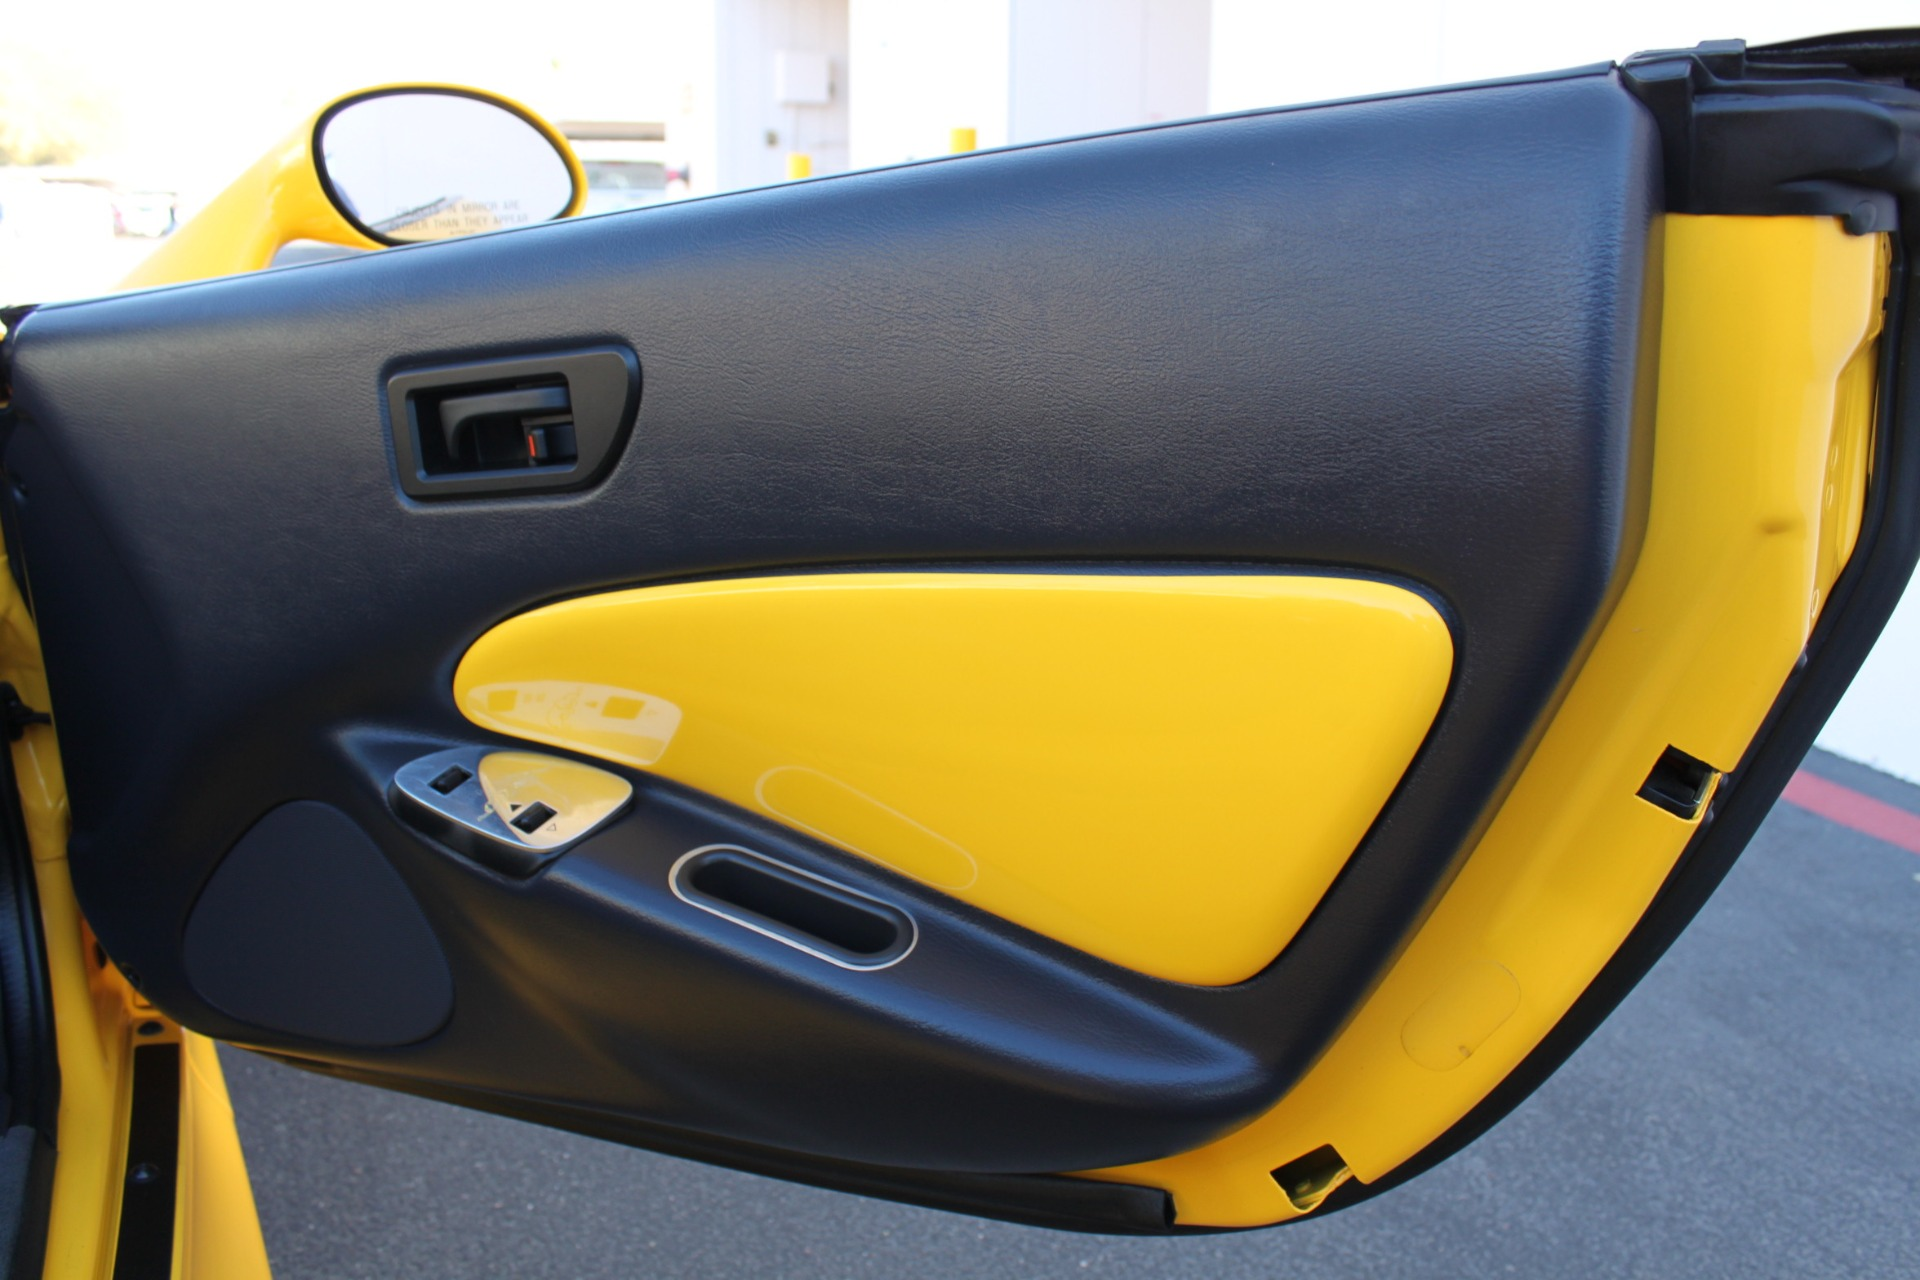 Used-2002-Chrysler-Prowler-Mercedes-Benz